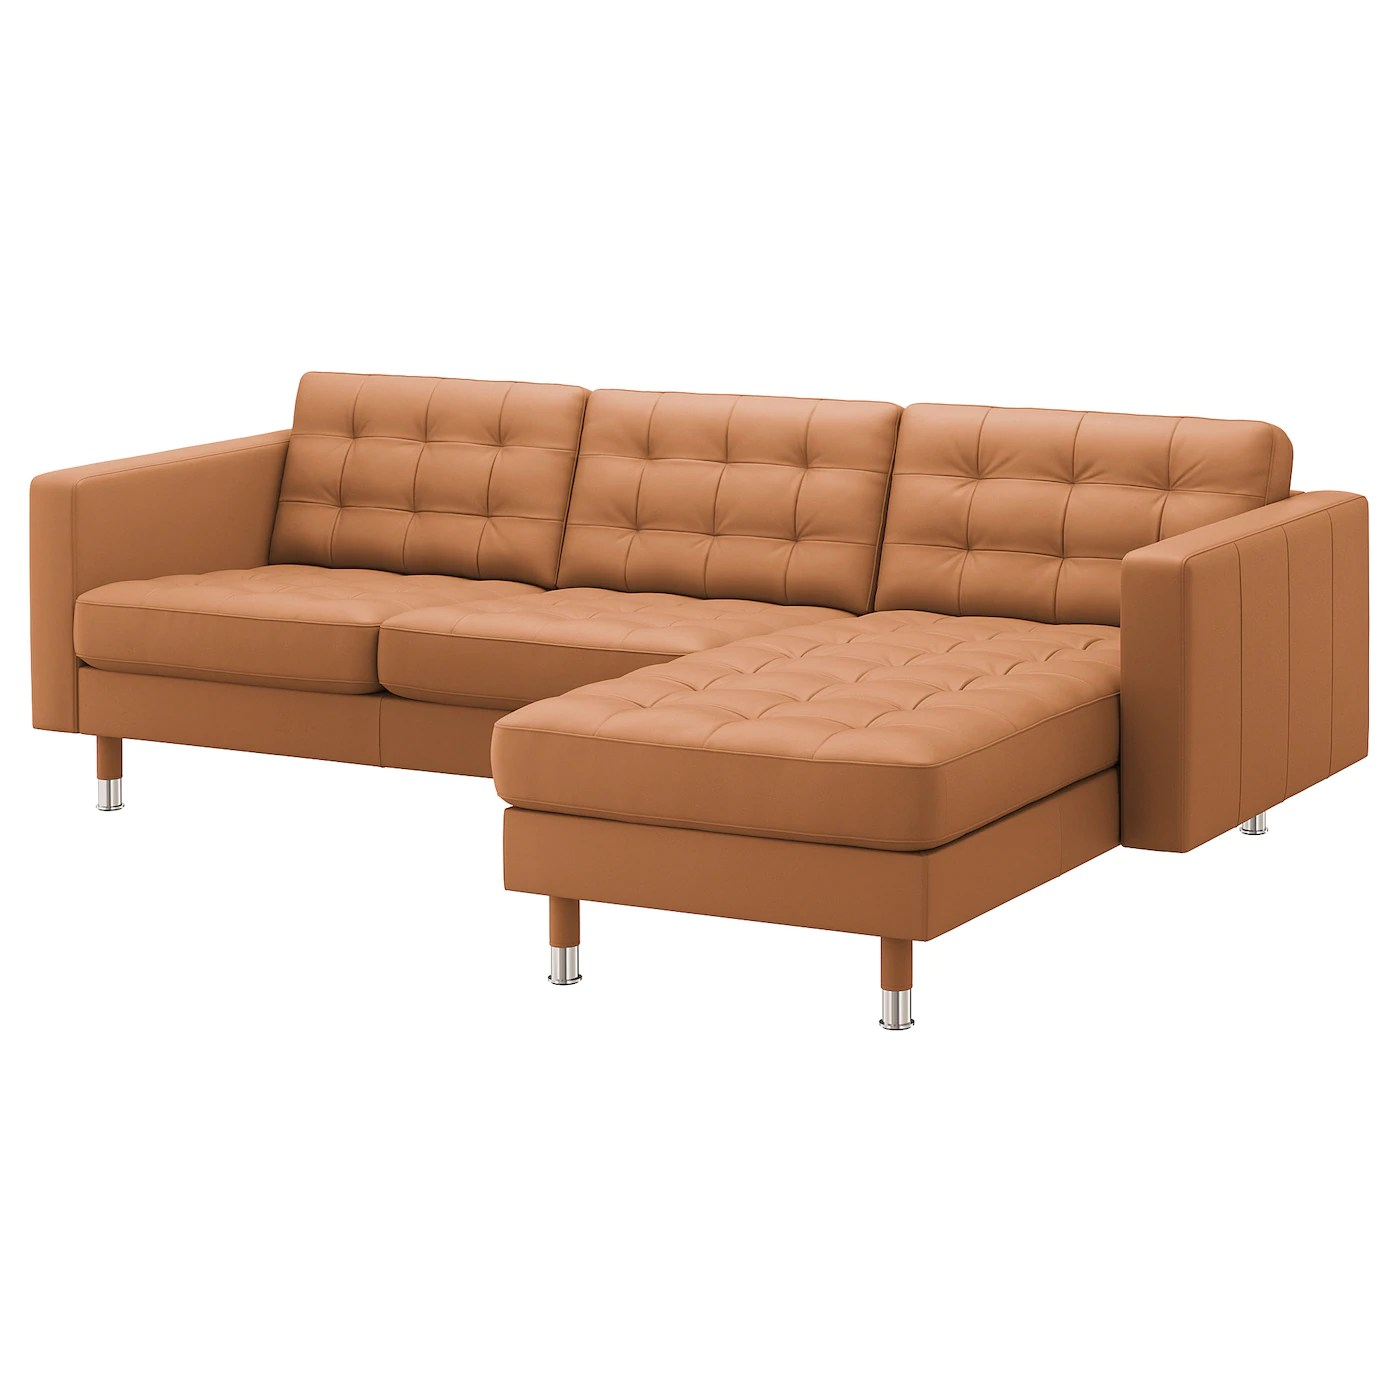 sofa 10 year guarantee jackson sofas landskrona 3 seat with chaise longue grann bomstad